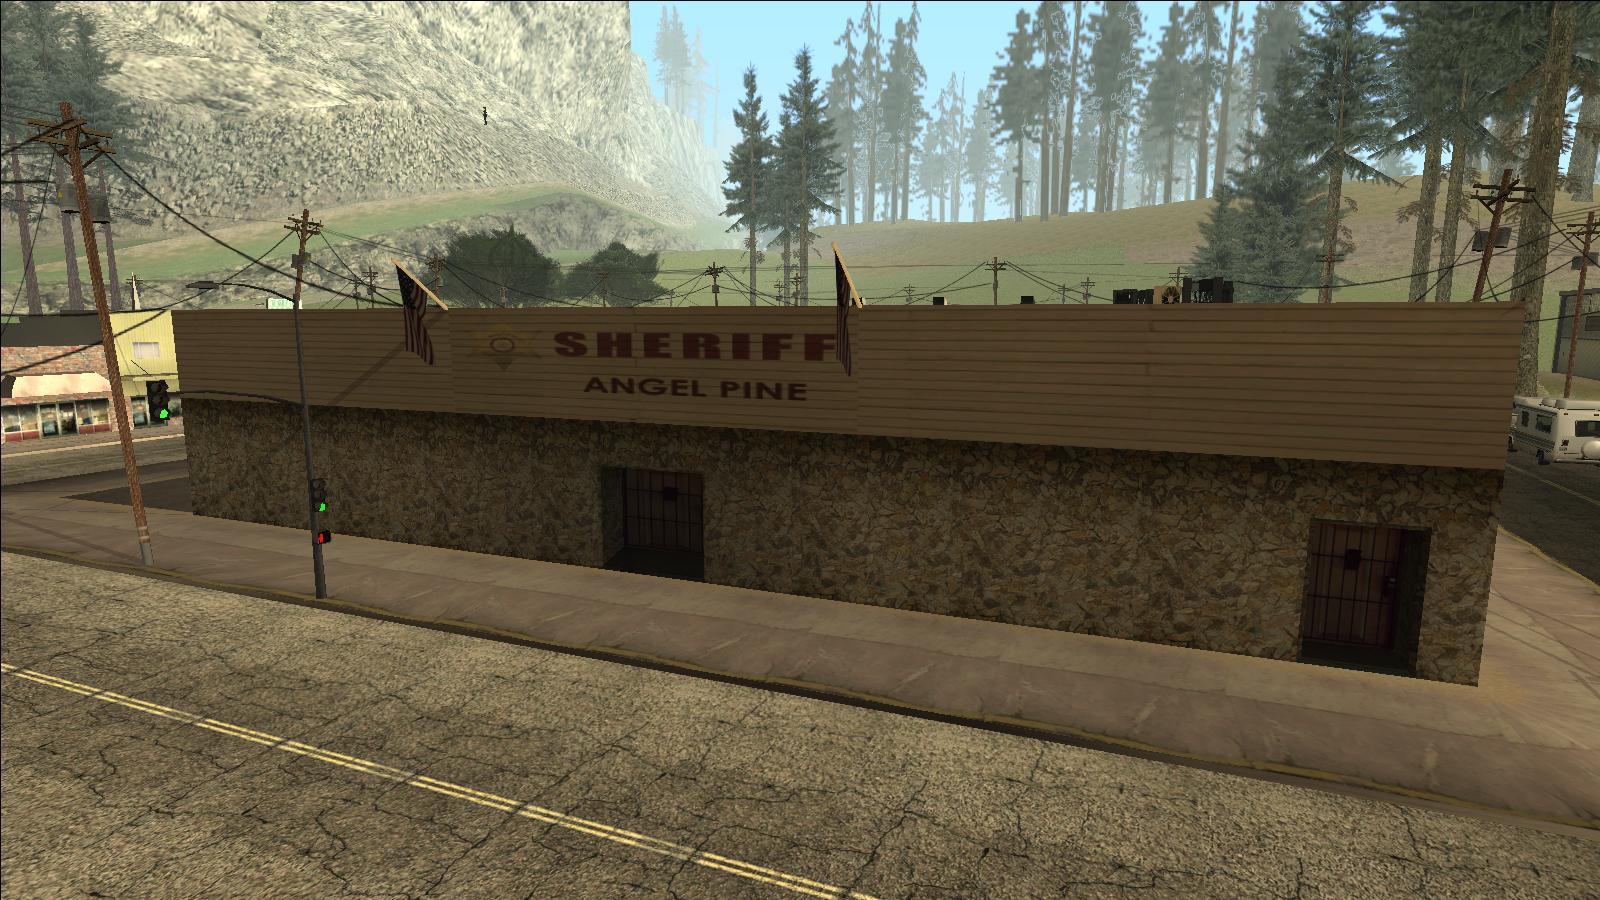 Angel Pine Sheriff's Station